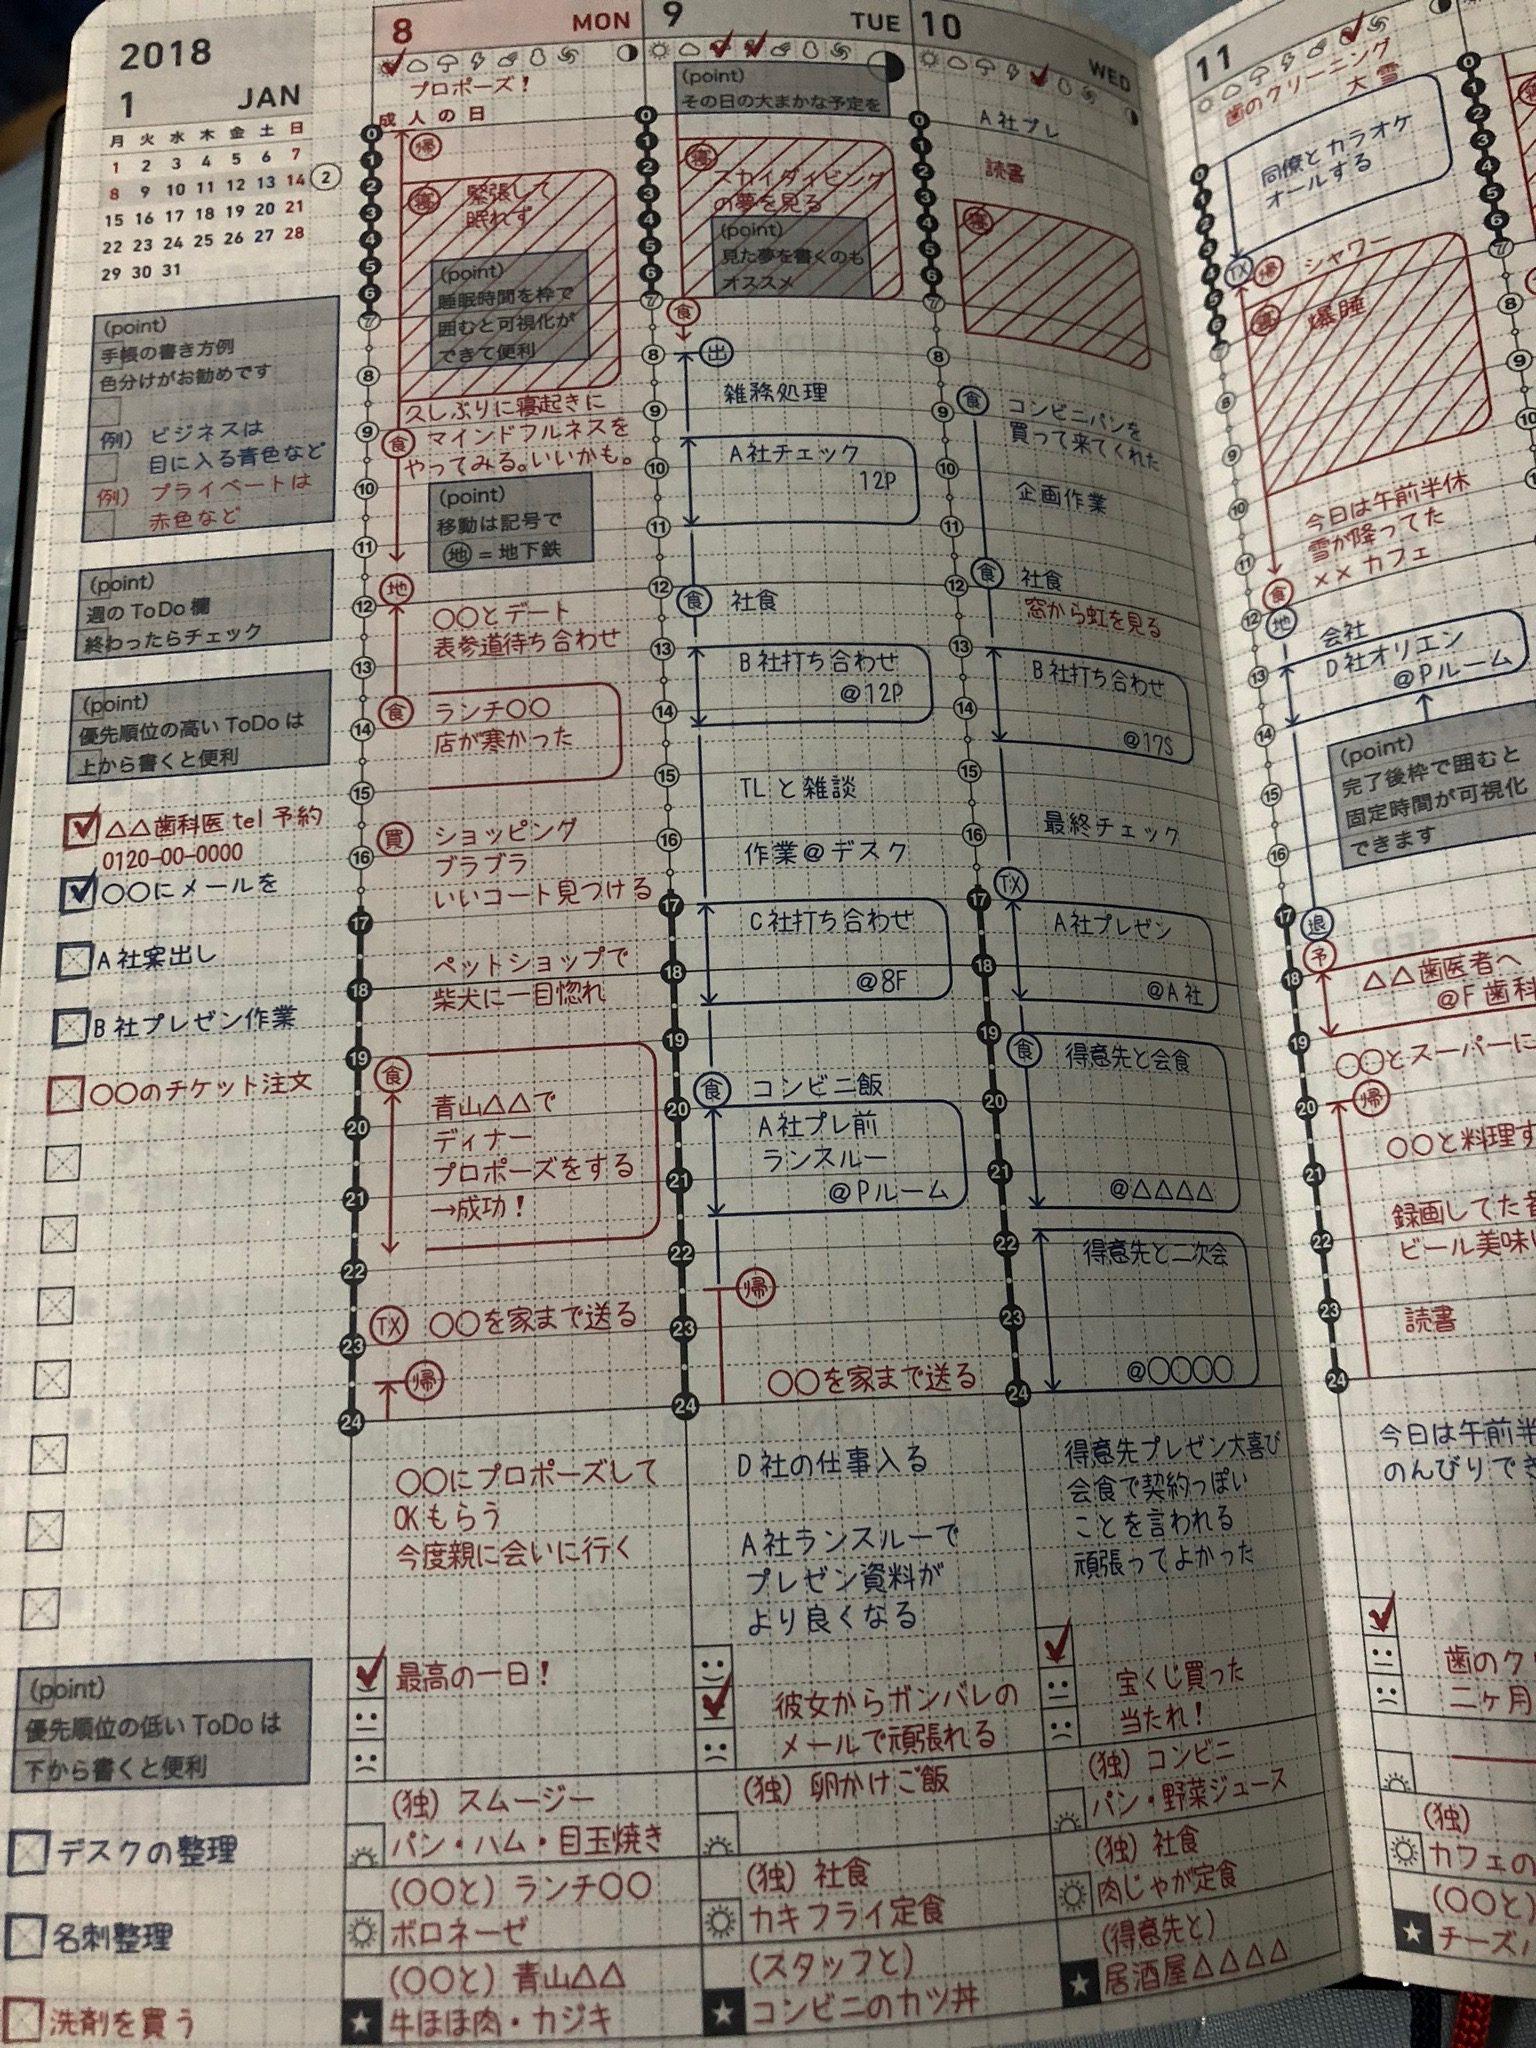 2018 NEWモデル!ジブン手帳 Biz mini でライフログ・目標管理